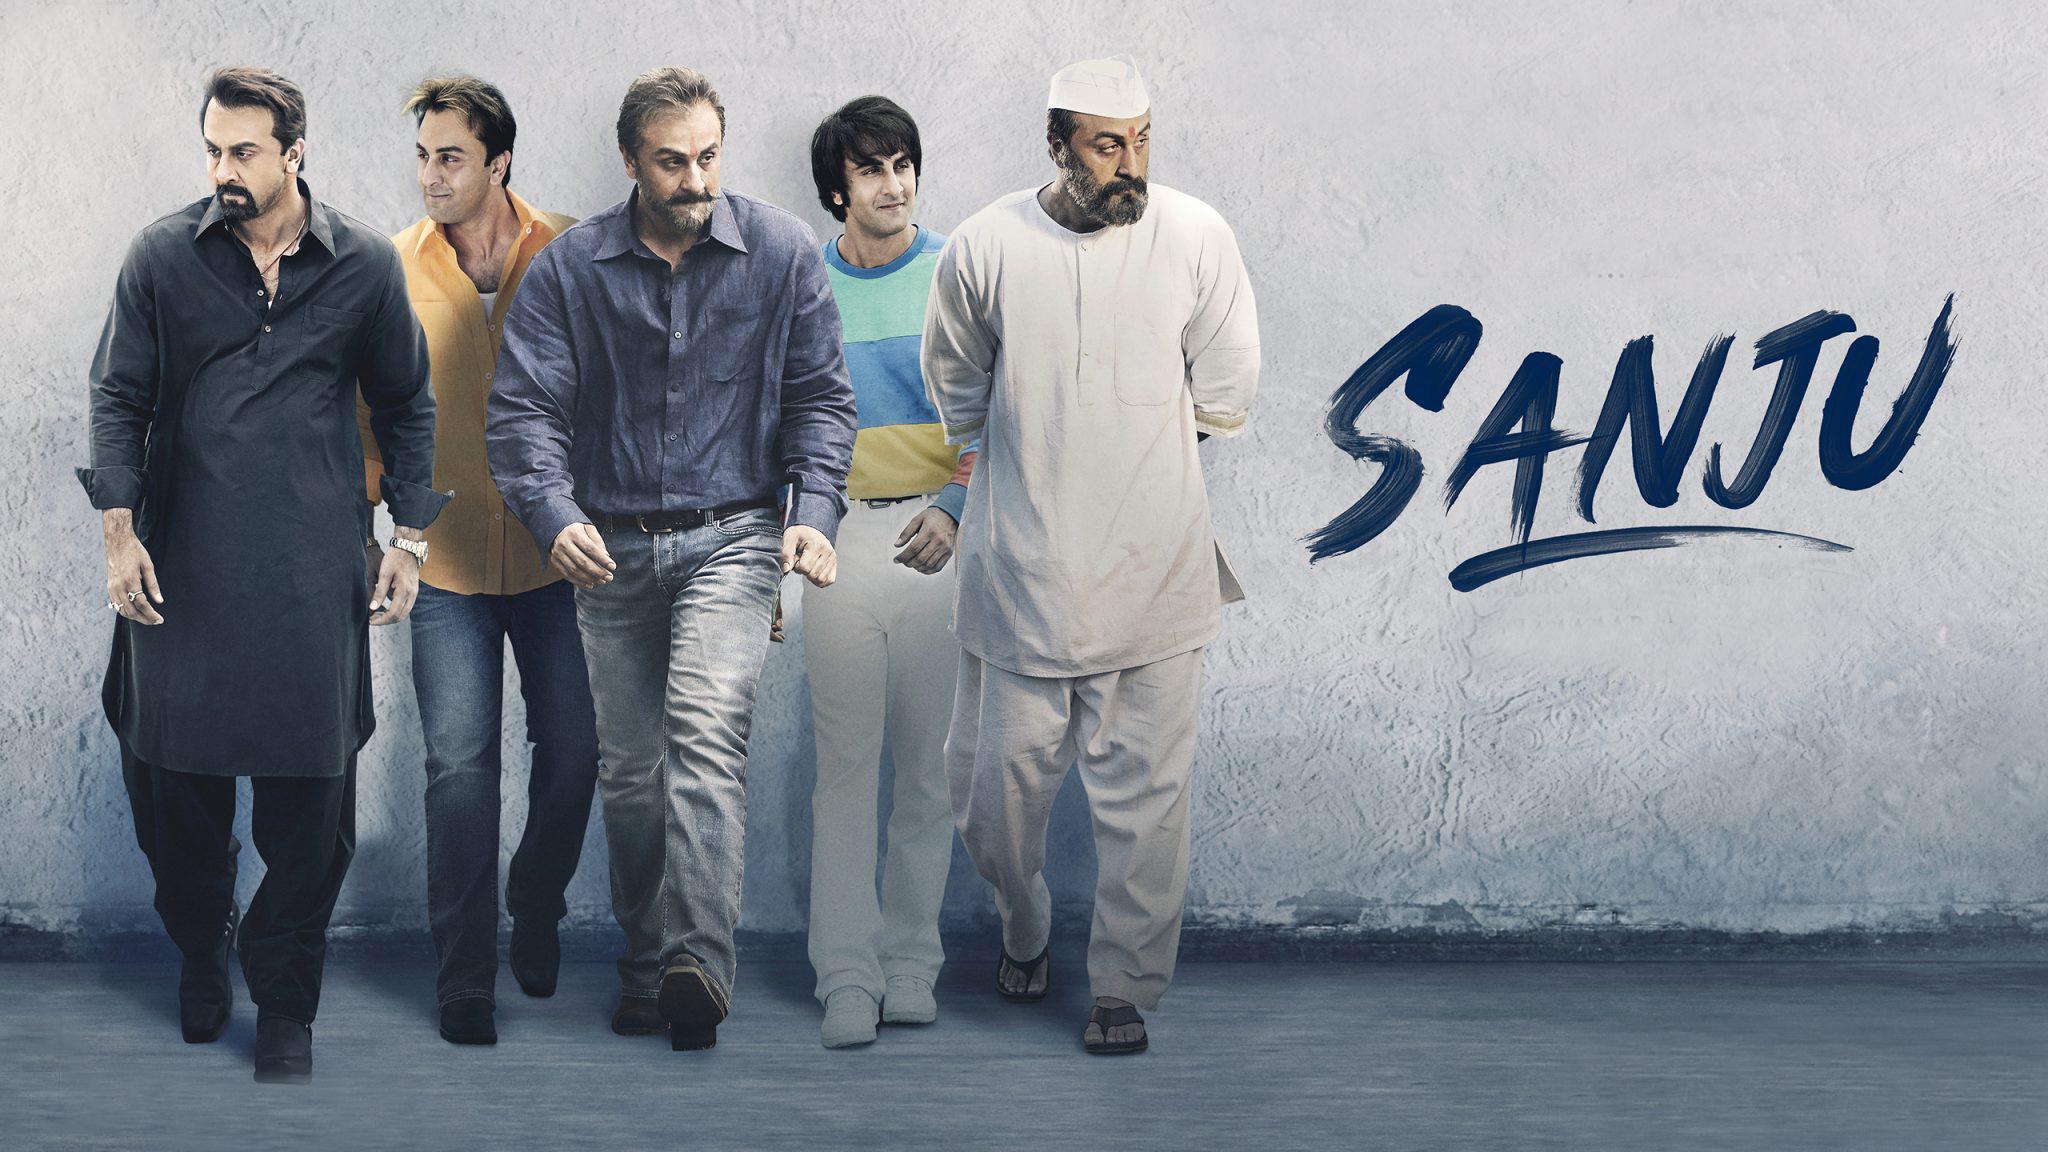 """I'd love to work with Ranbir Kapoor again""  - Raju Hirani"